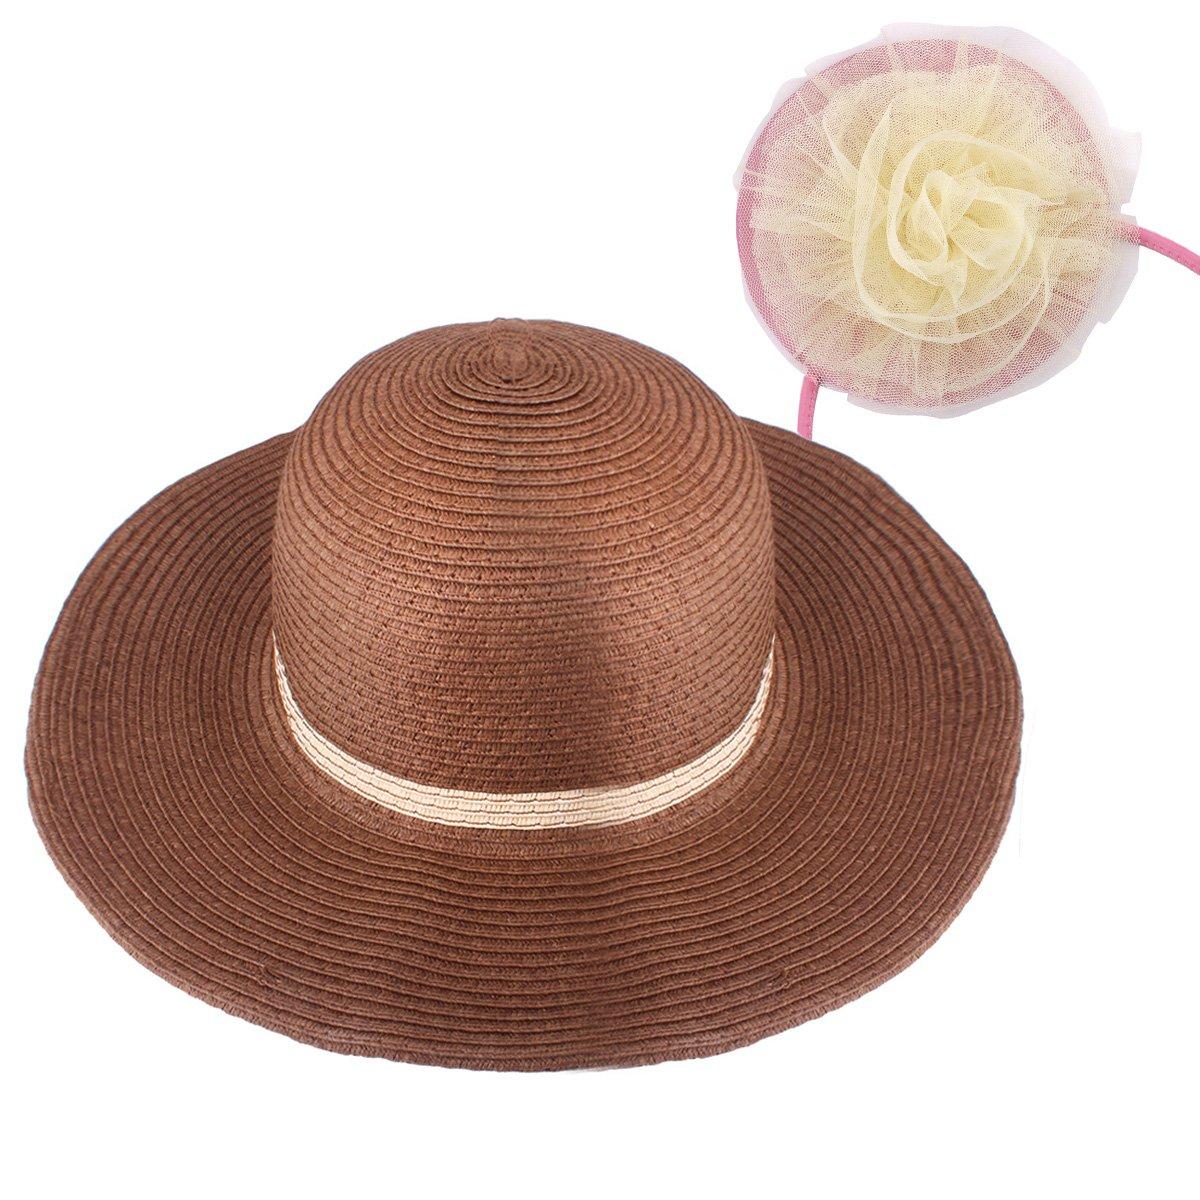 YOPINDO Girl Hat Purse Set Straw Sun Hat Floppy Summer Beach Cap with Hand Bag (Style A-Pink)